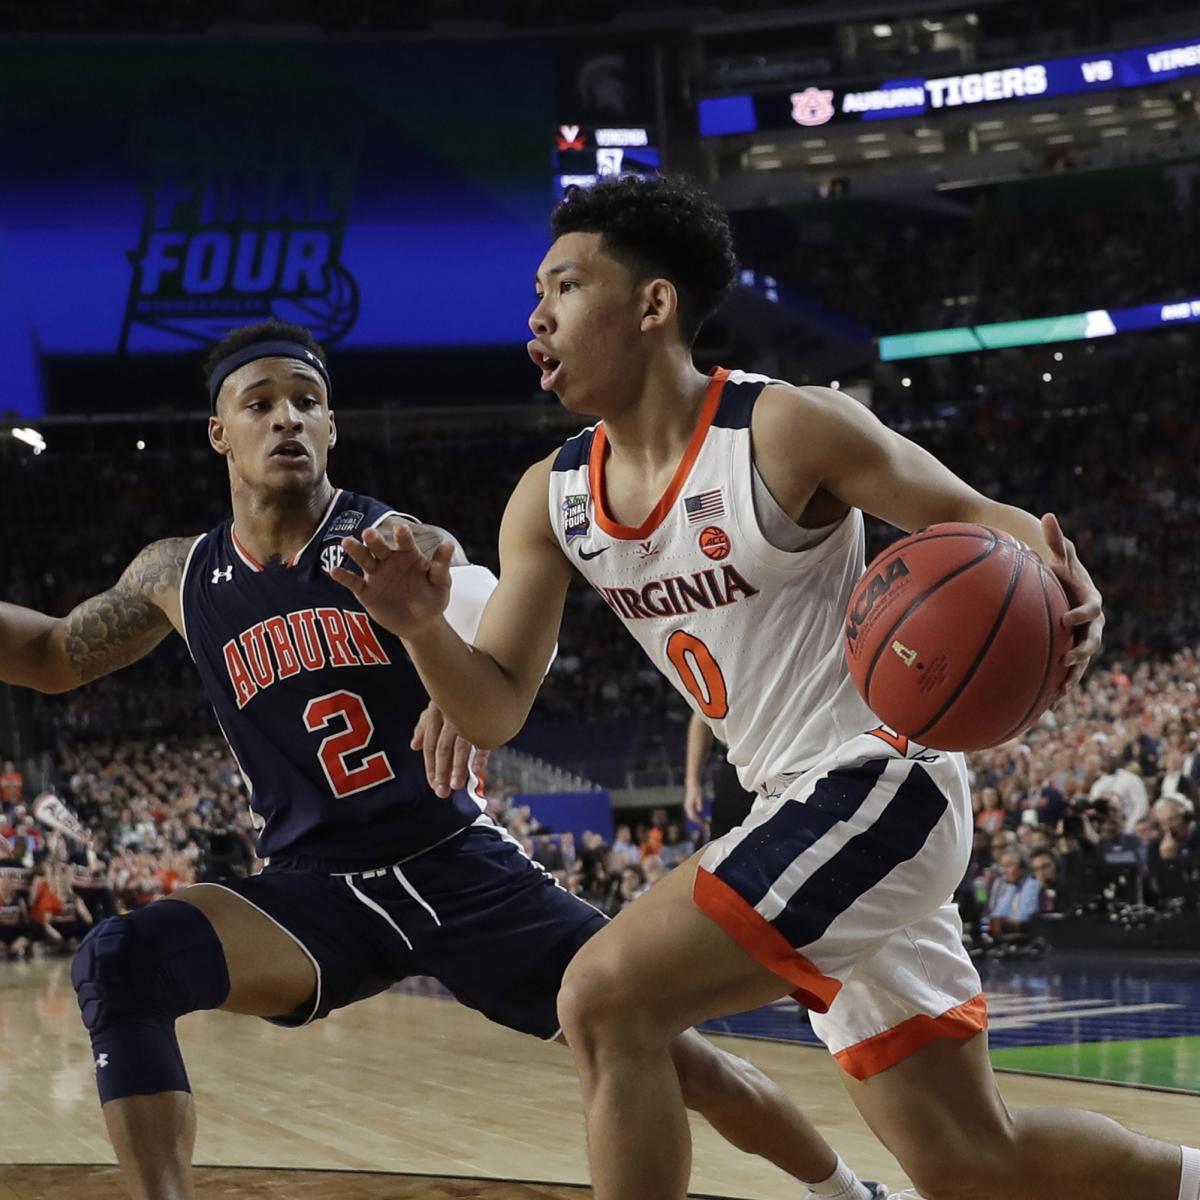 UVA Vs. Texas Tech: 2019 NCAA Championship Vegas Odds